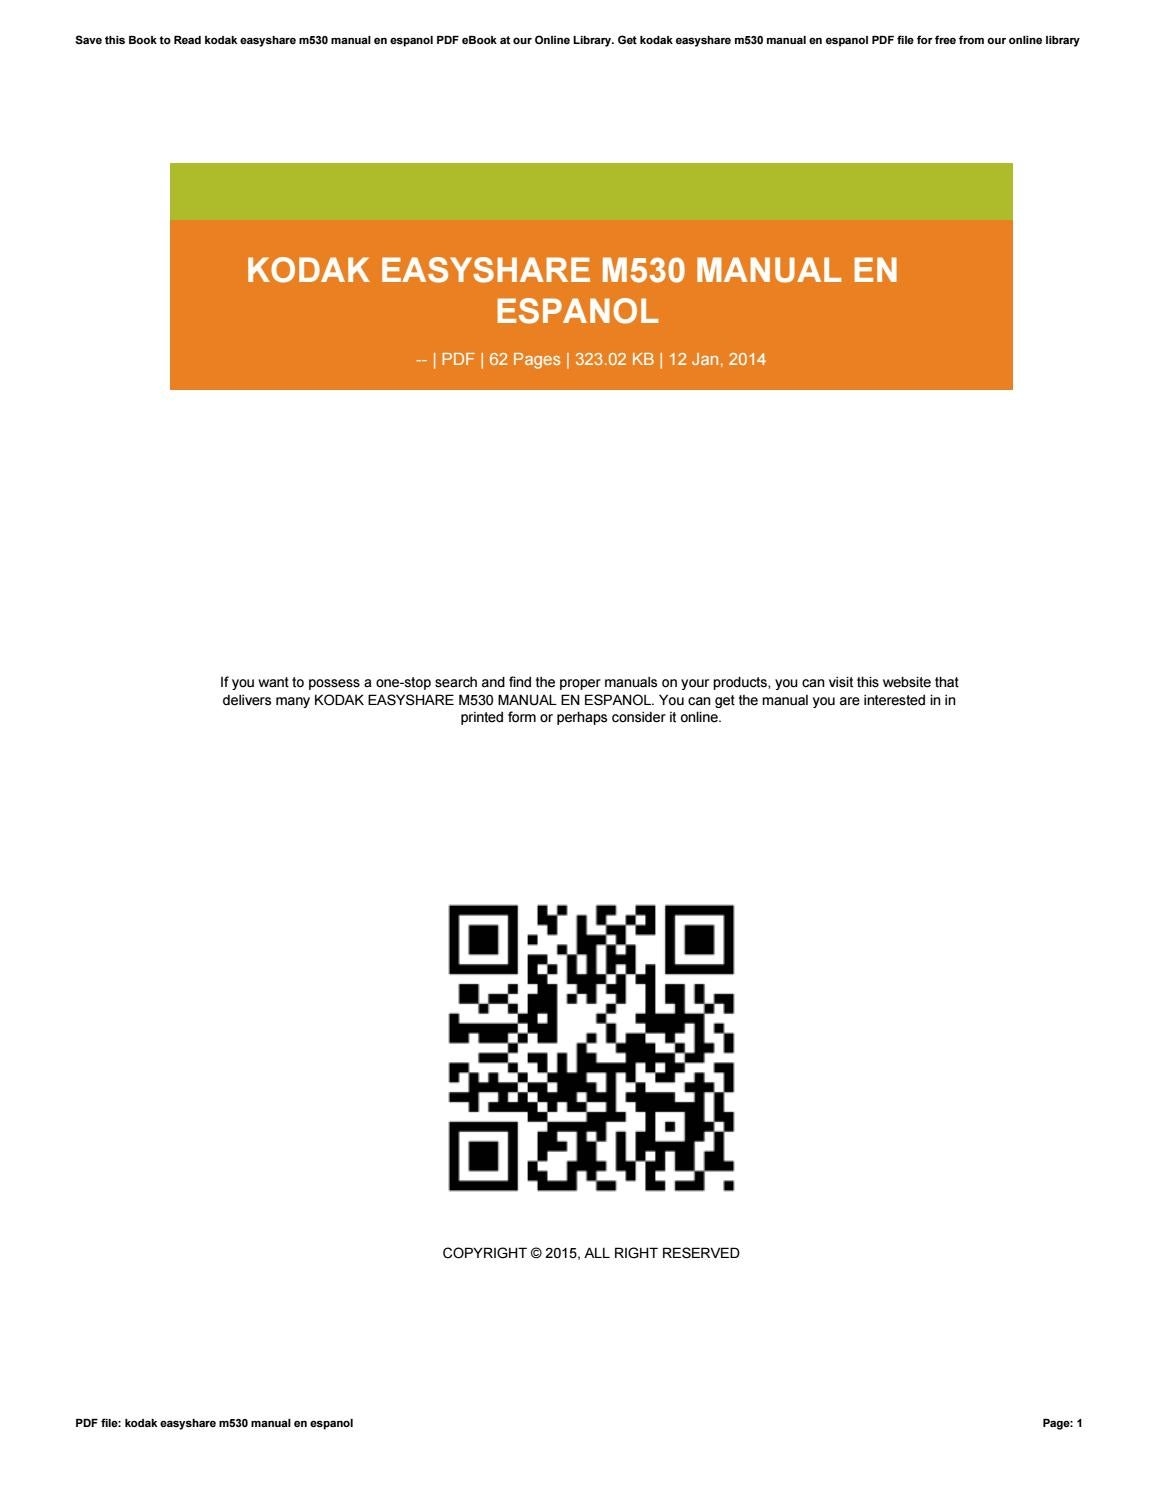 Kodak easyshare m530 manual en espanol by eropa78jsioak - issuu